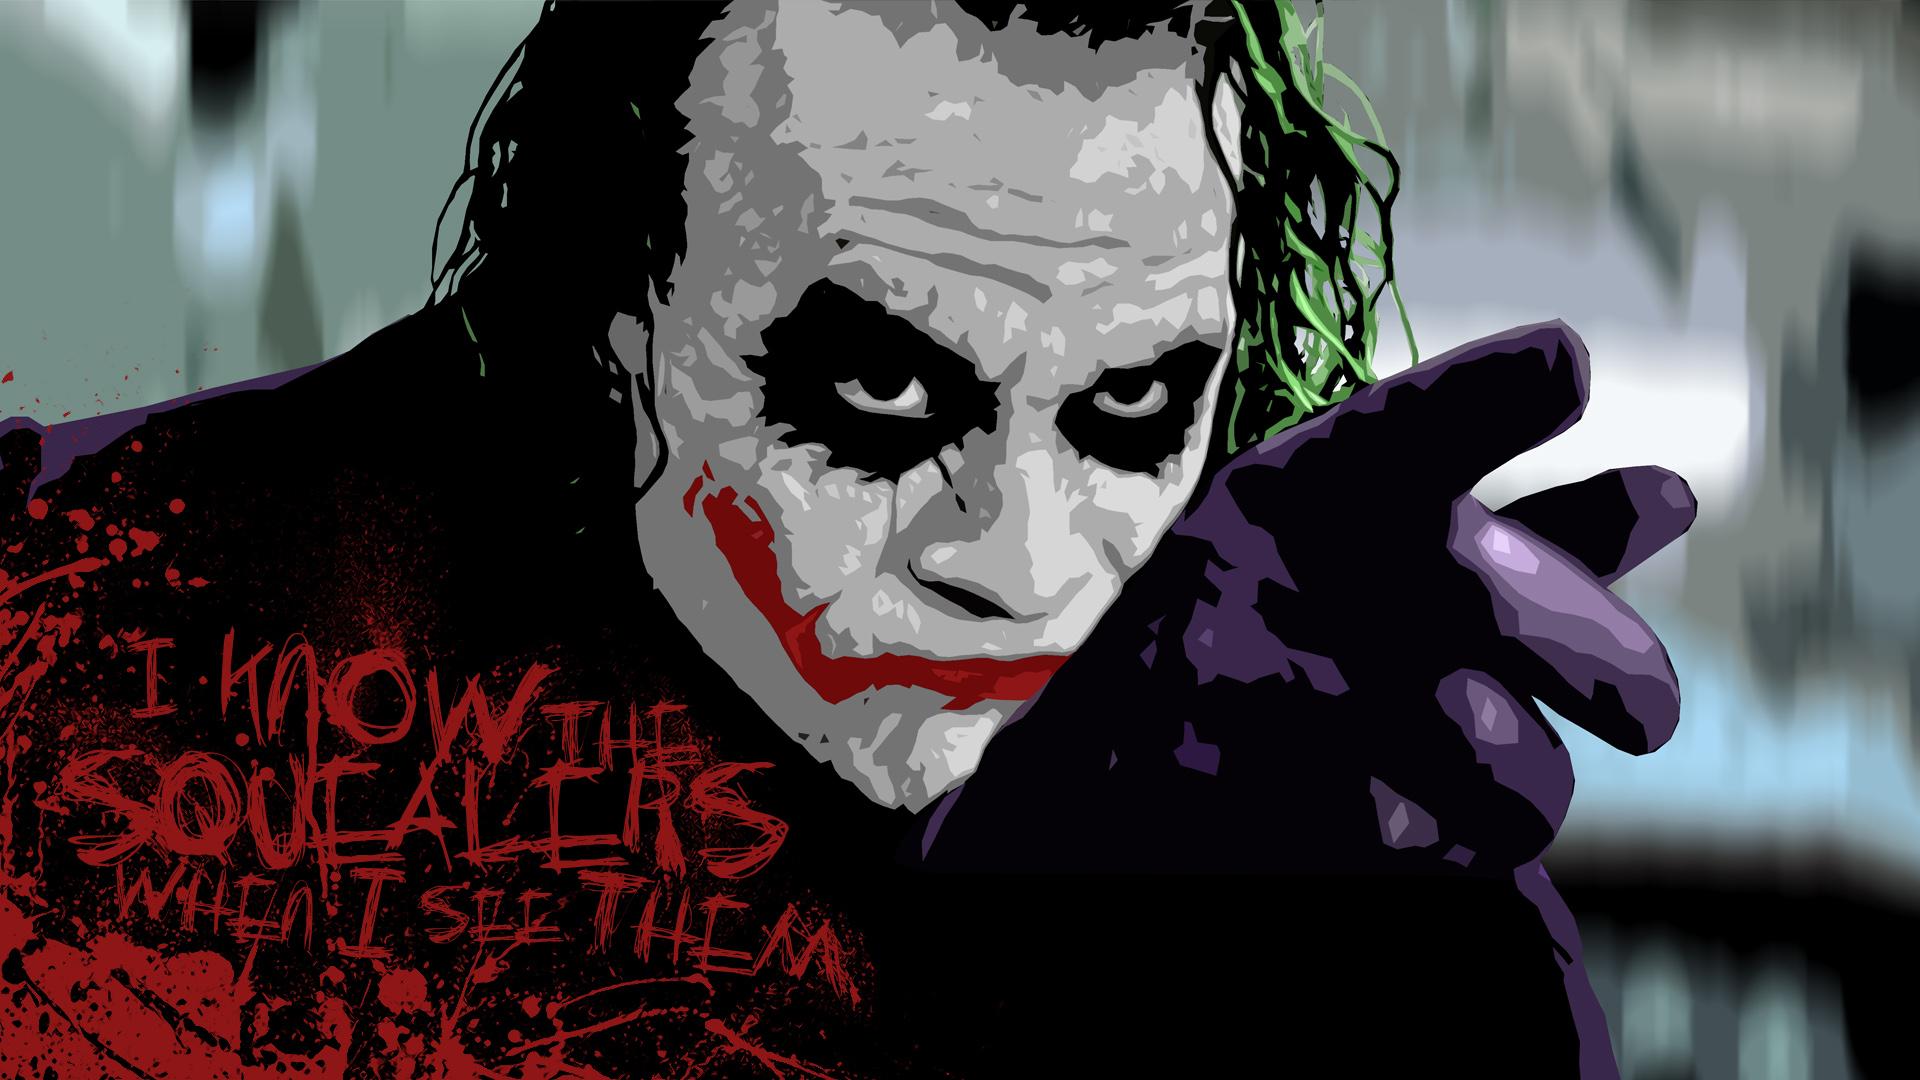 joker   The Joker Wallpaper 28092759 1920x1080